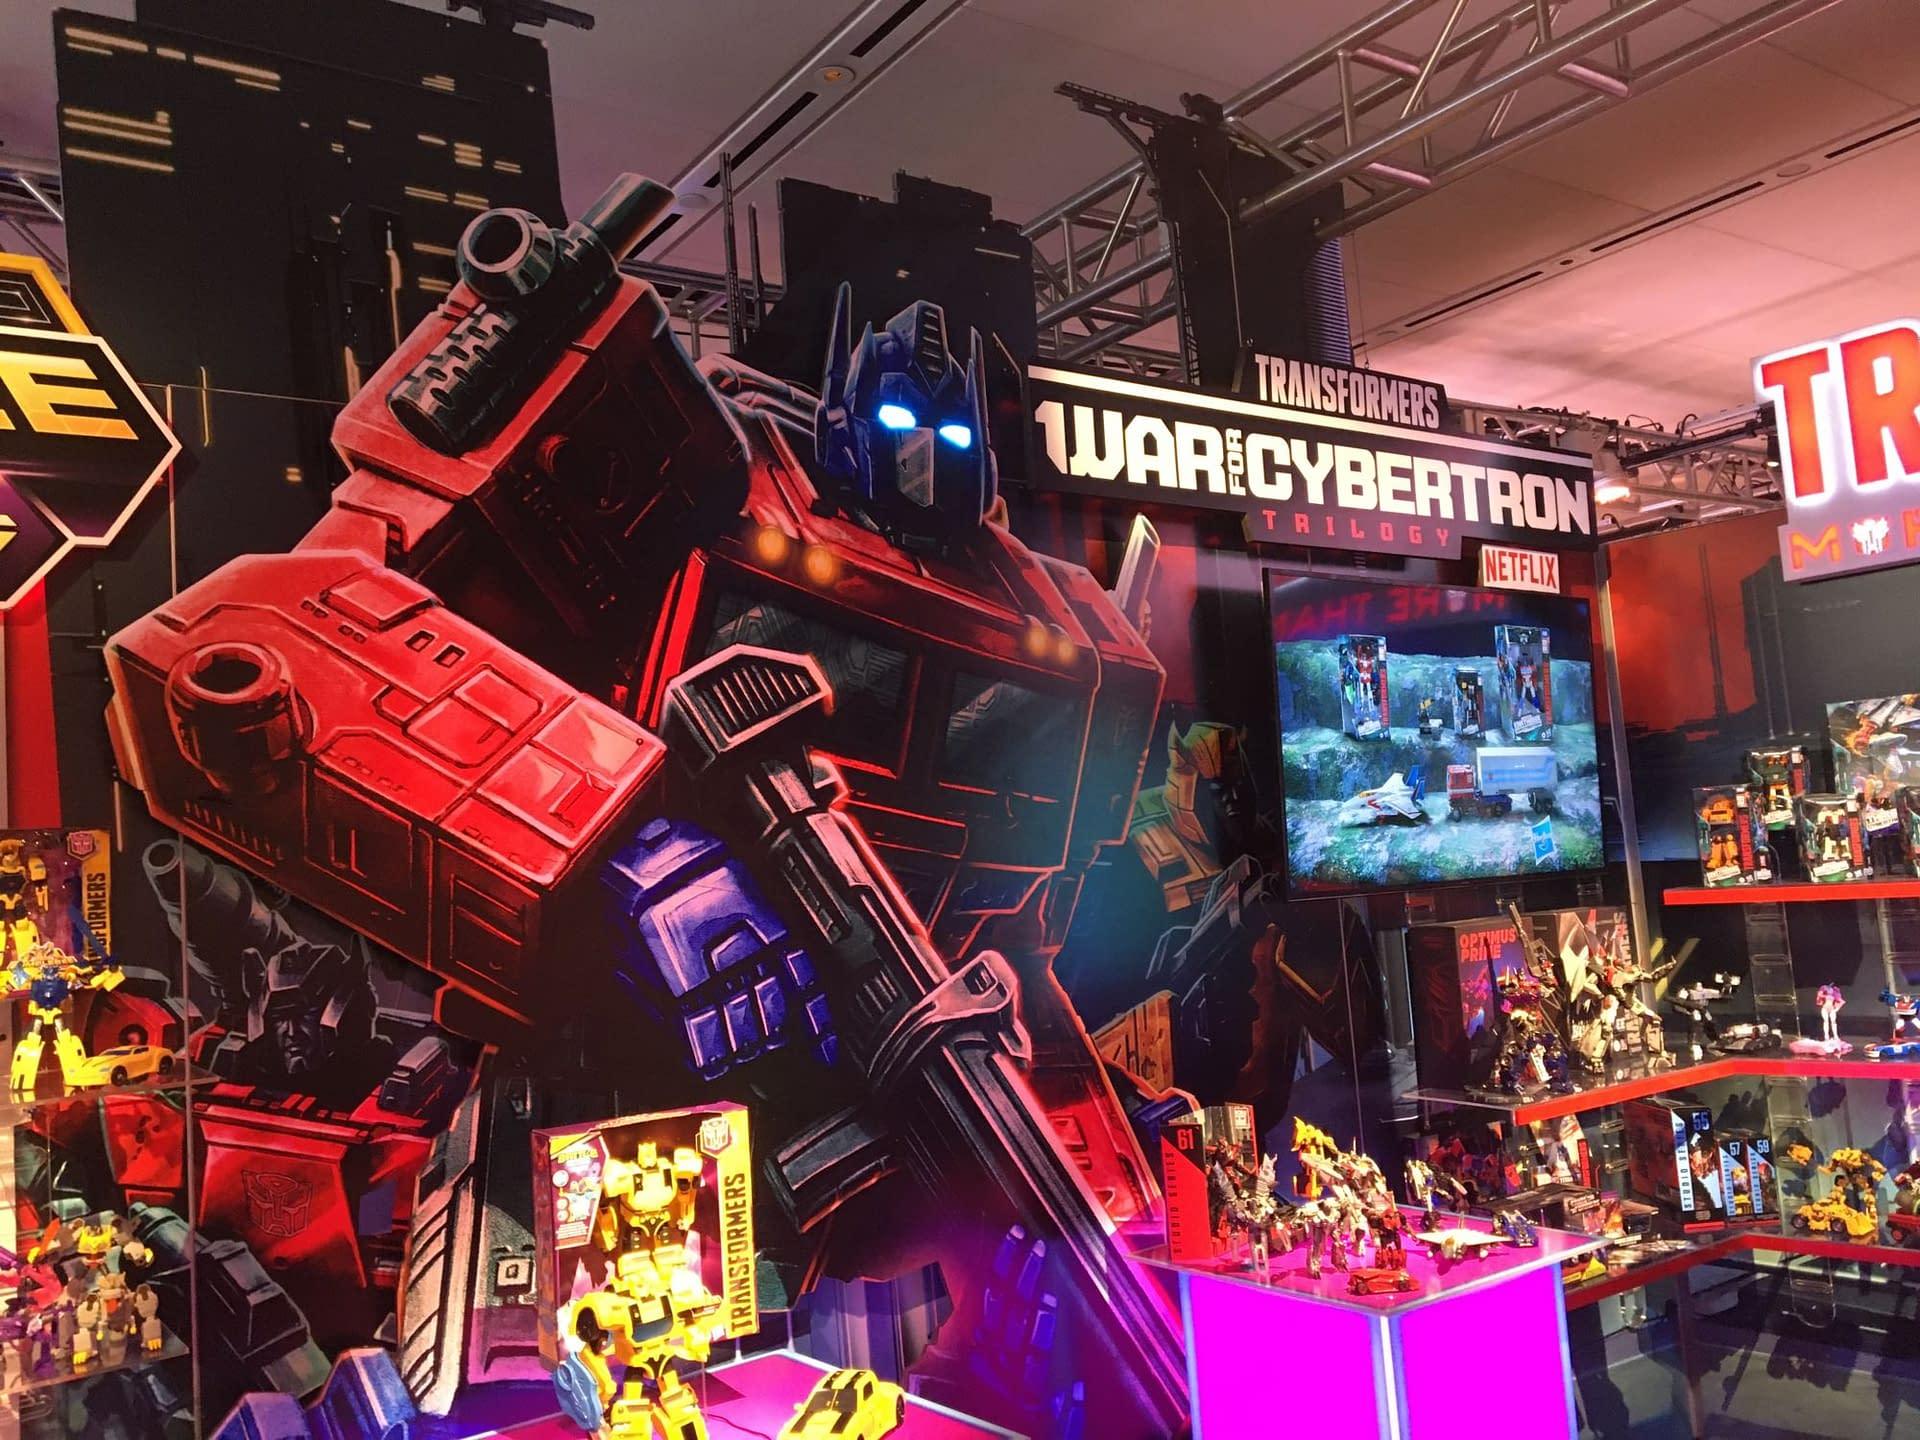 Toy Fair 2020 - Hasbro's the Transformers